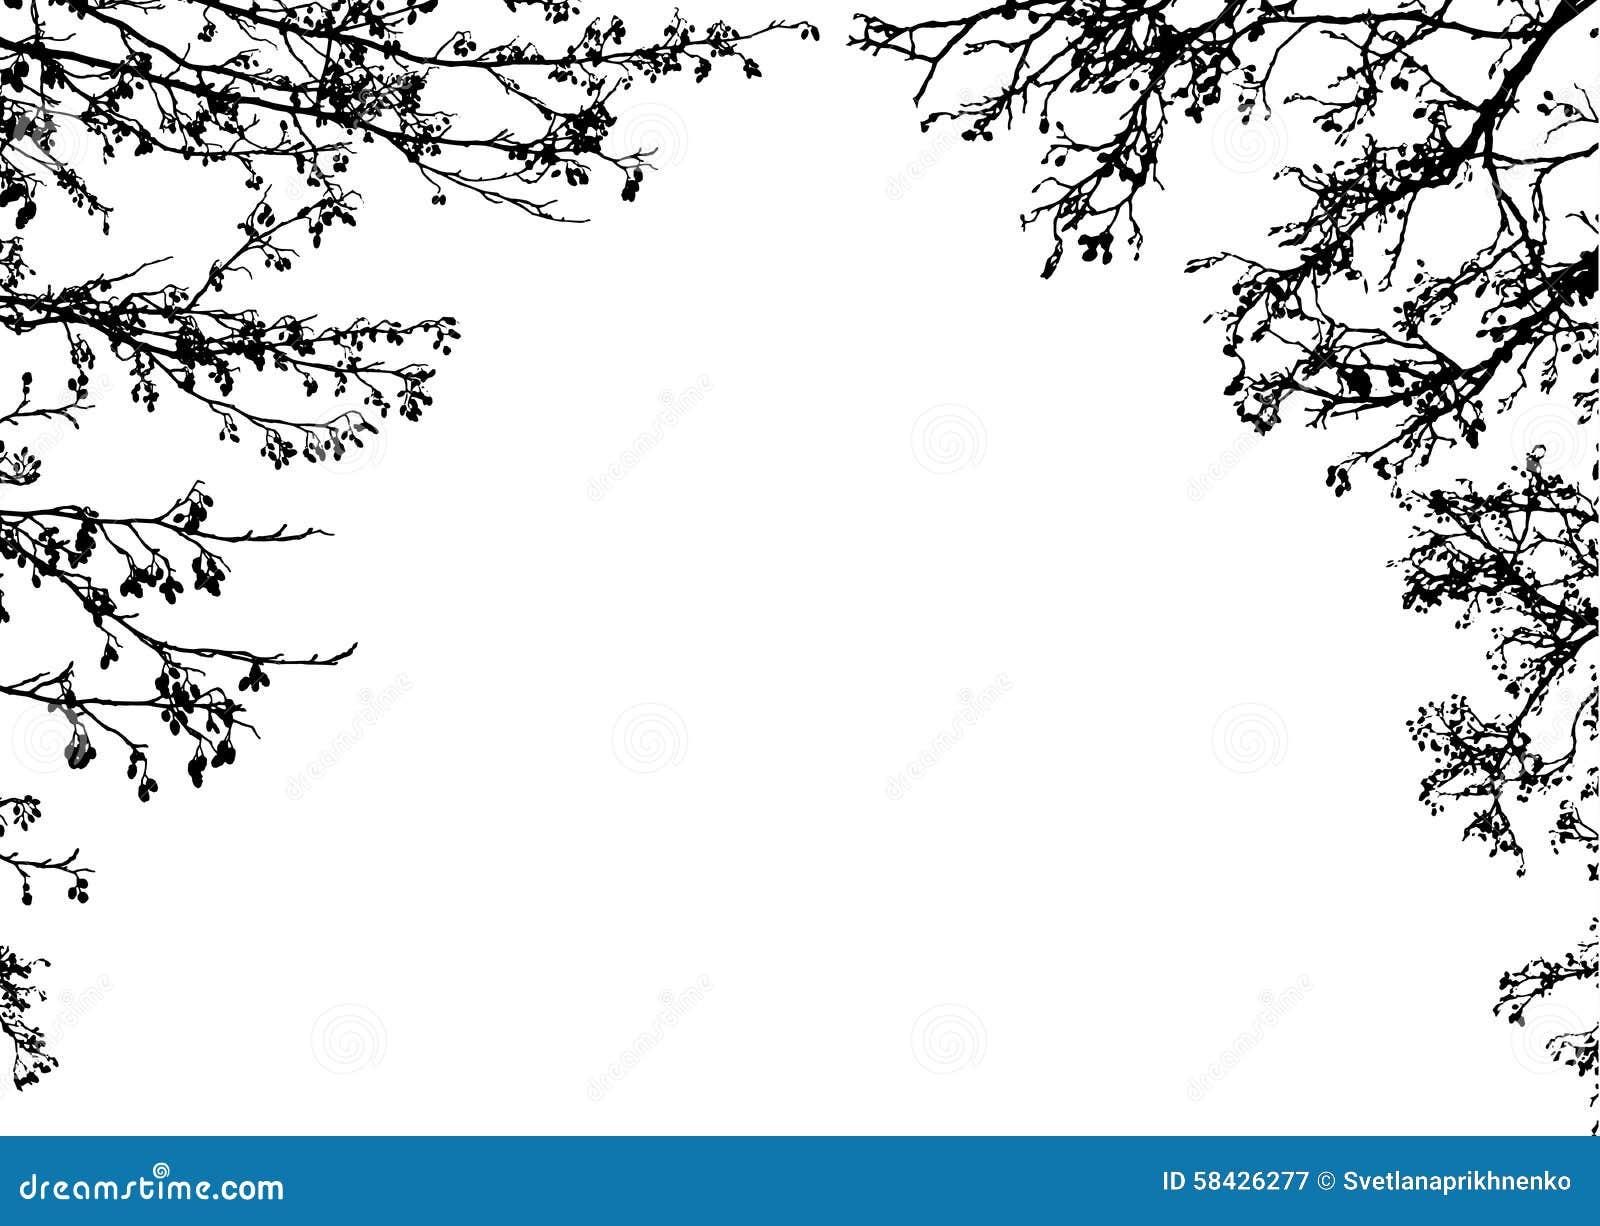 clipart tree branch borders - photo #7